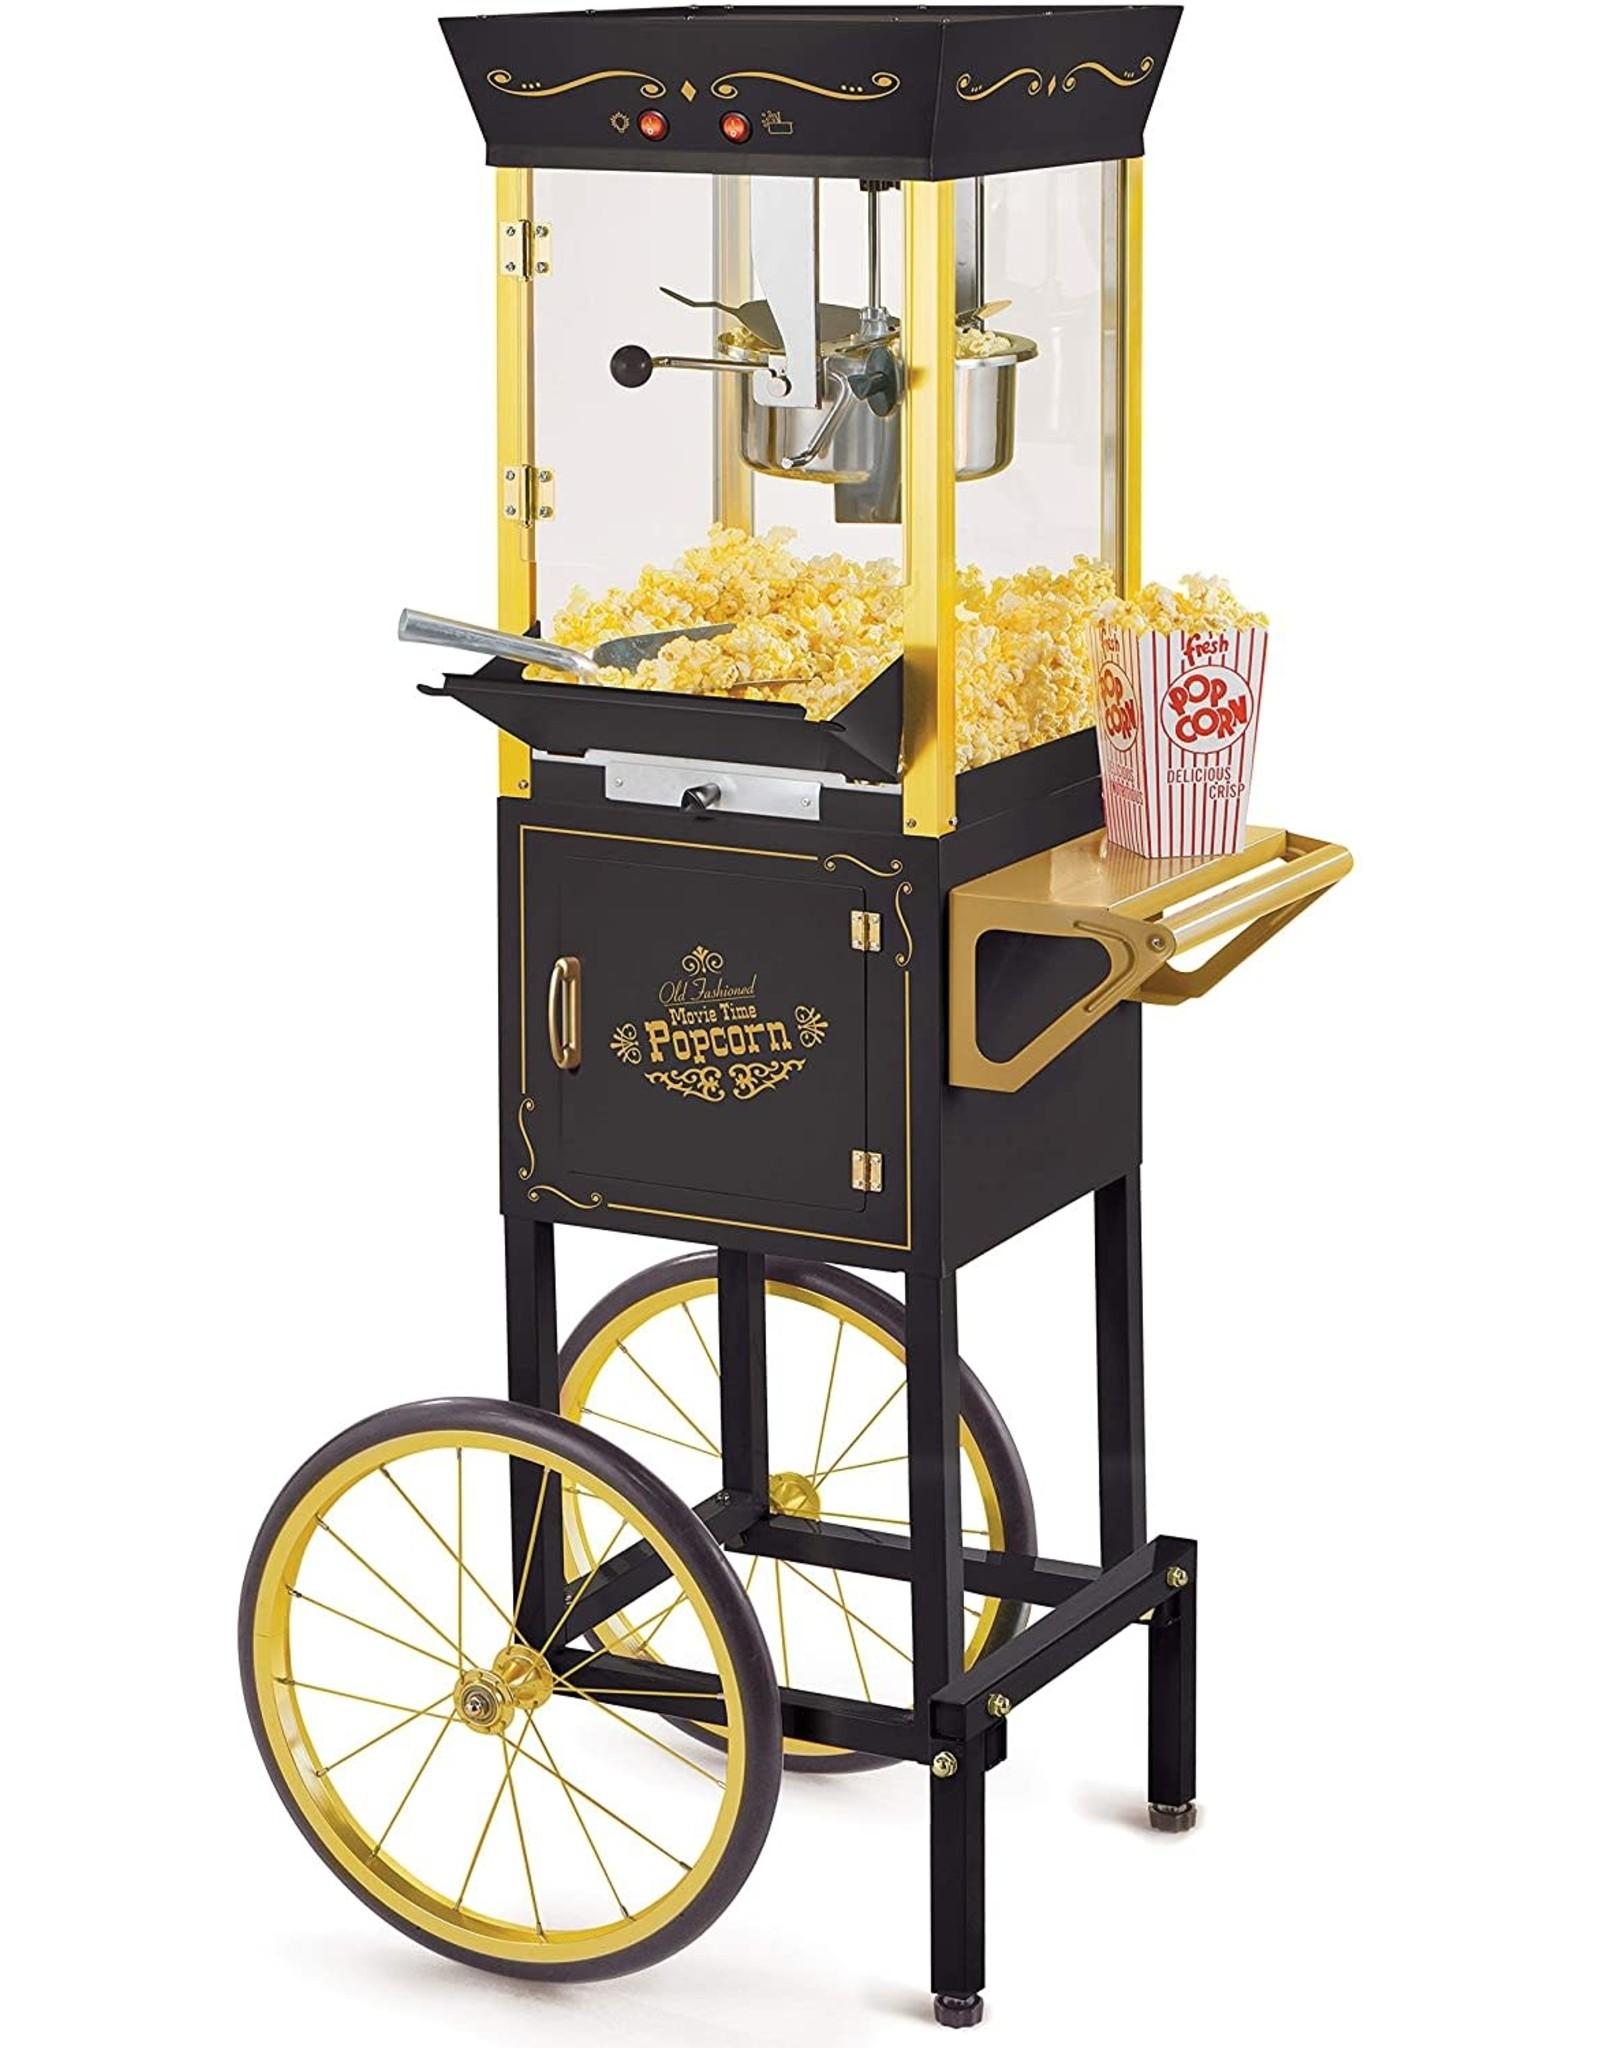 Nostalgia Vintage 8 oz. Red Oil Popcorn Machine with Cart